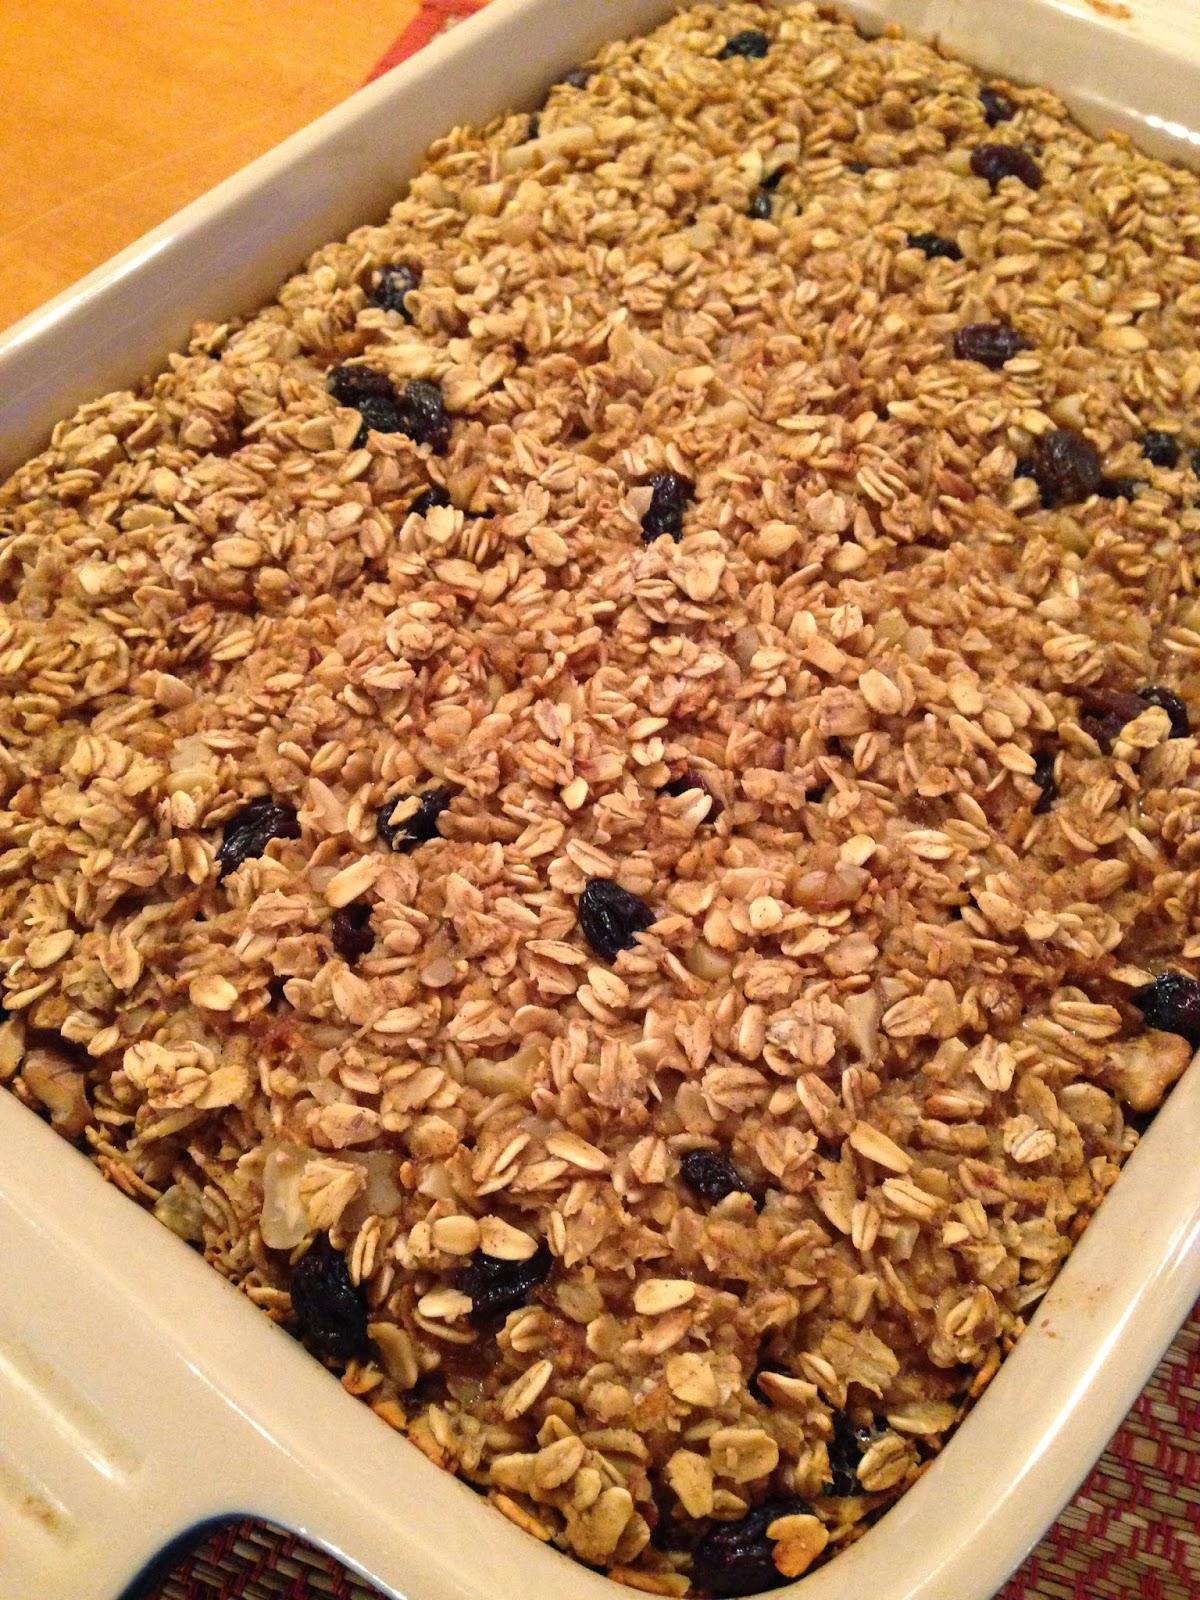 Baked Oatmeal | katesfoodfortheweek.blogspot.com